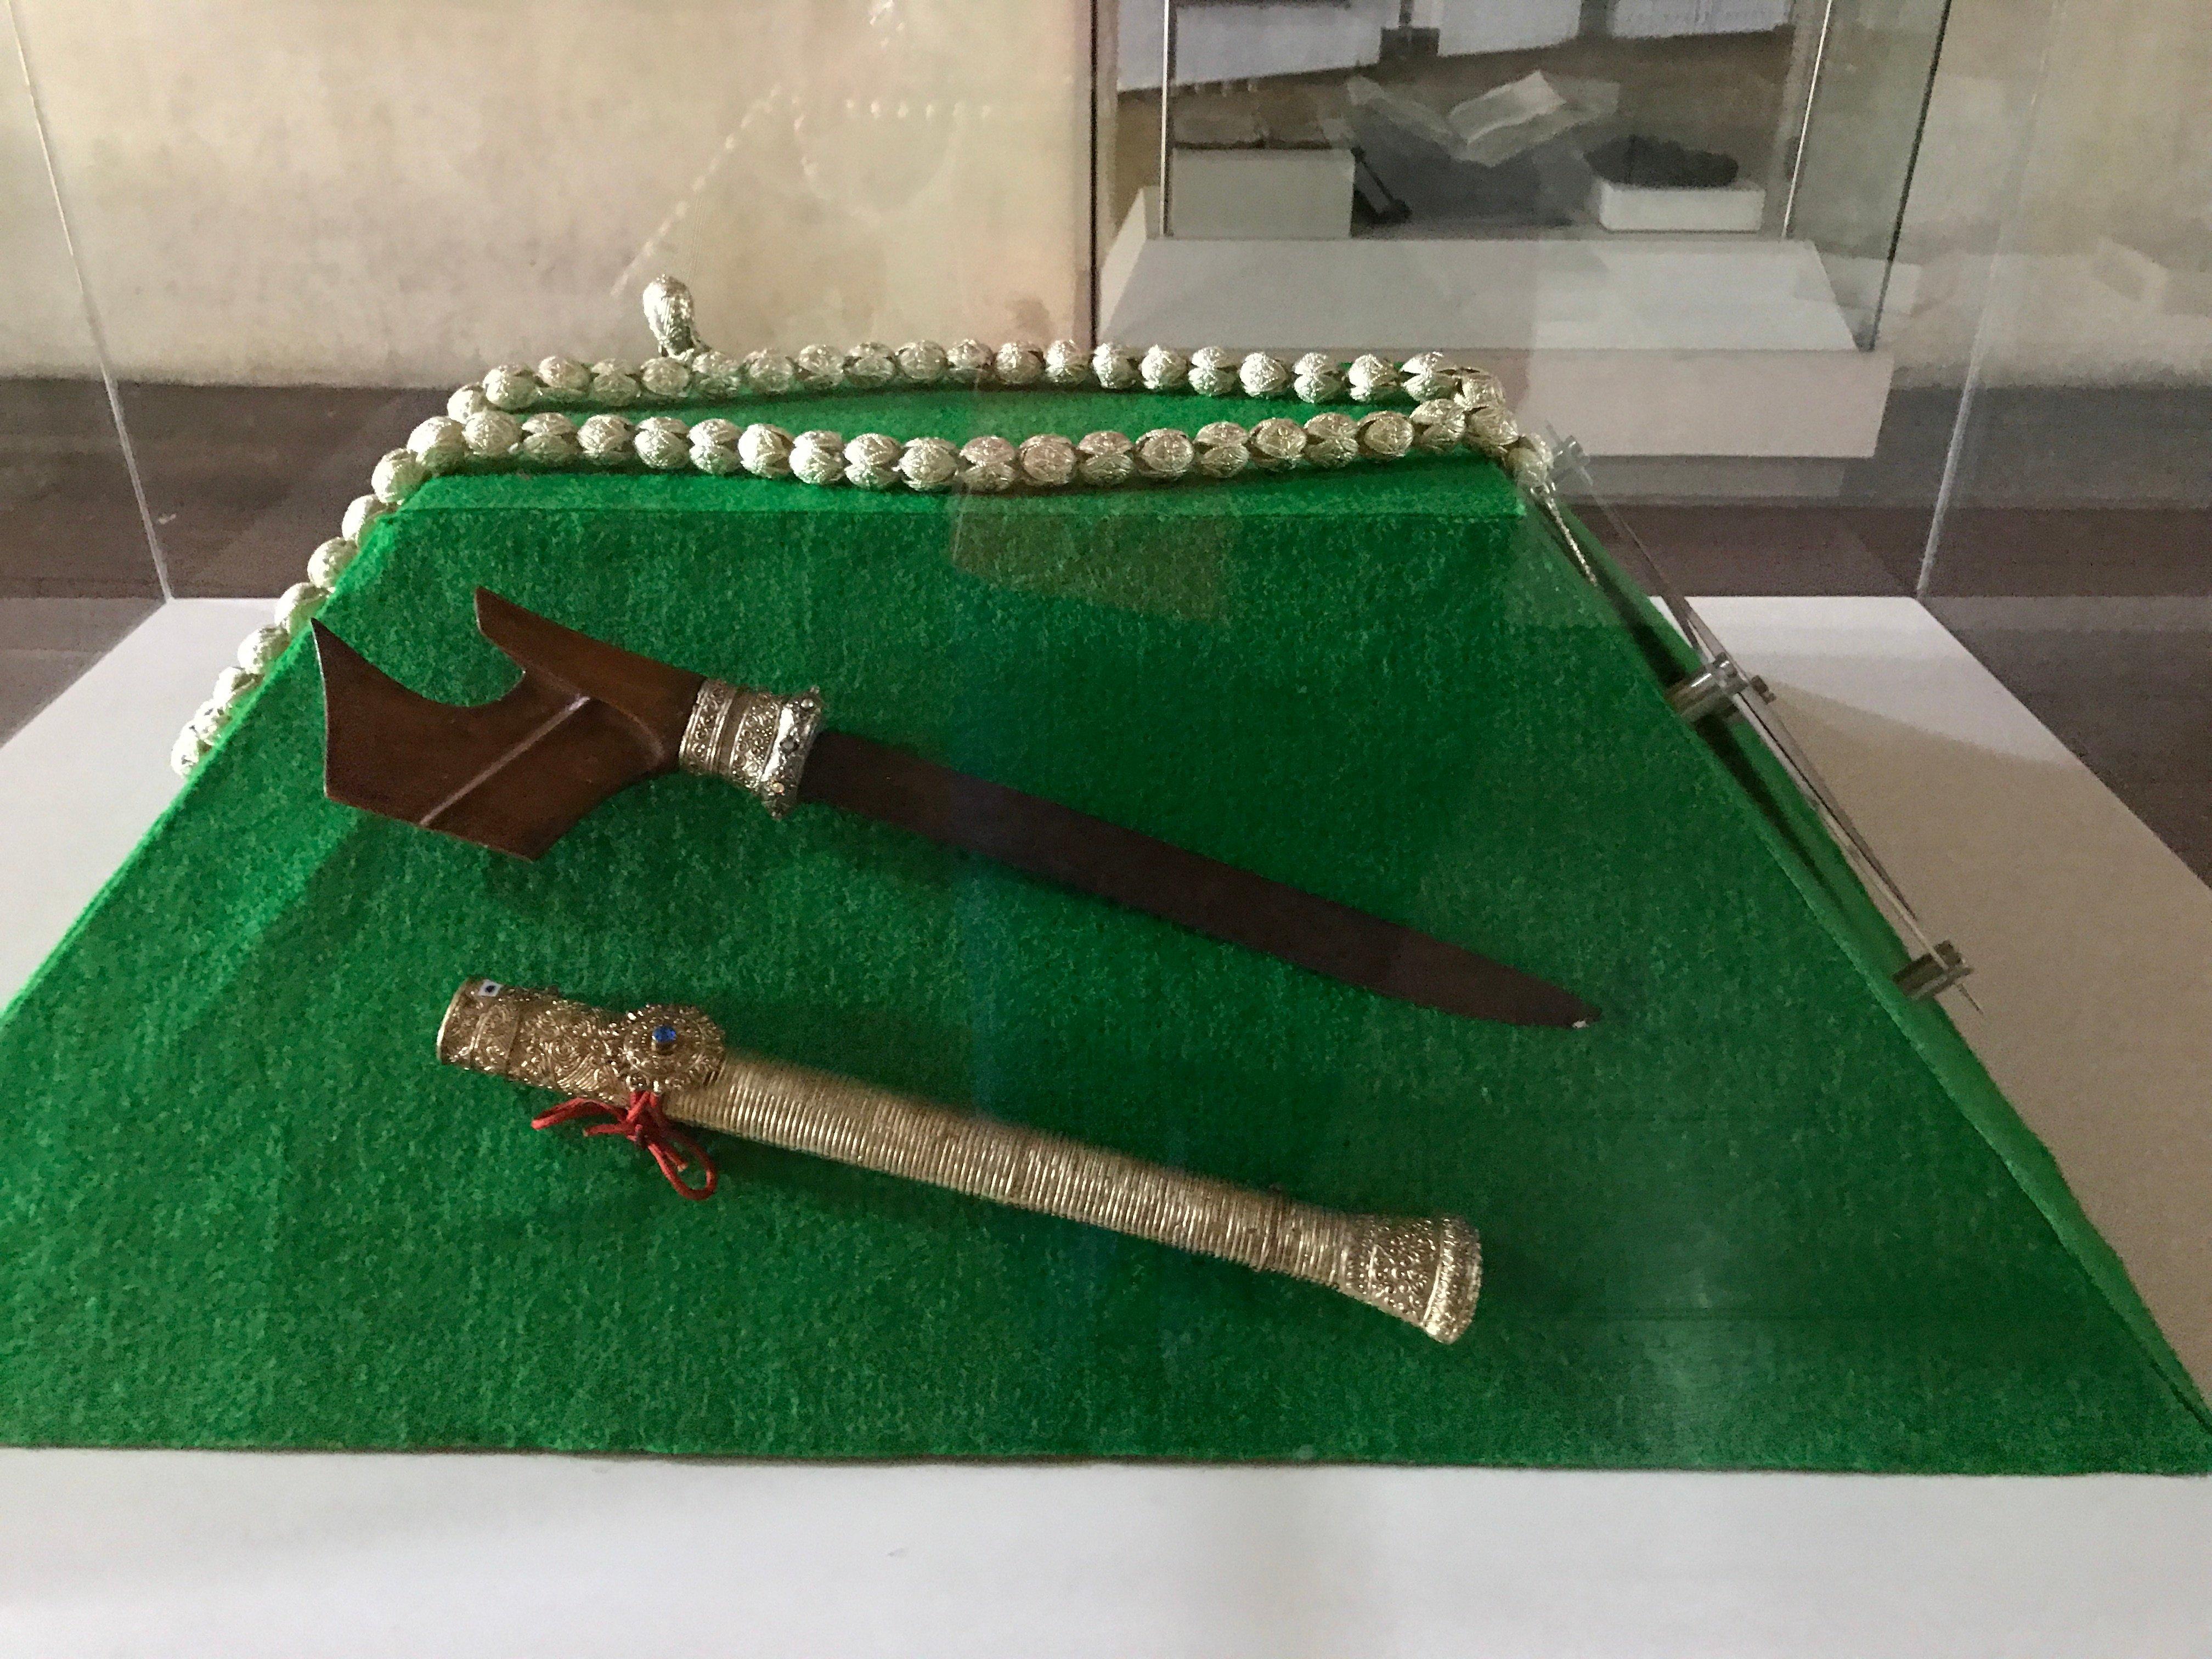 Pulotravels 17 Melihat Koleksi Museum La Galigo Makassar Steemit Berikut